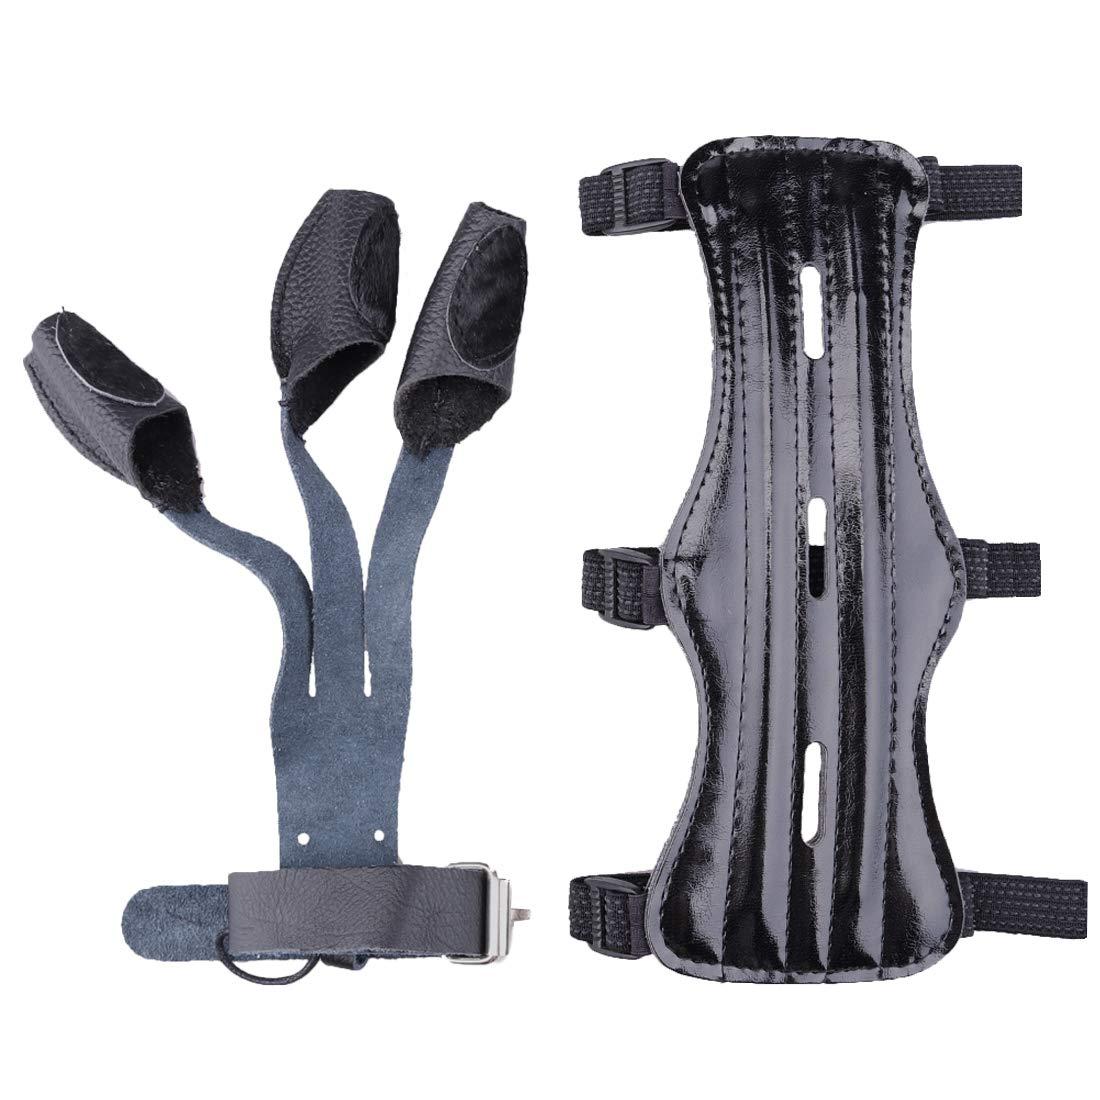 KRATARC Adjustable Protective Accessory Lightweight